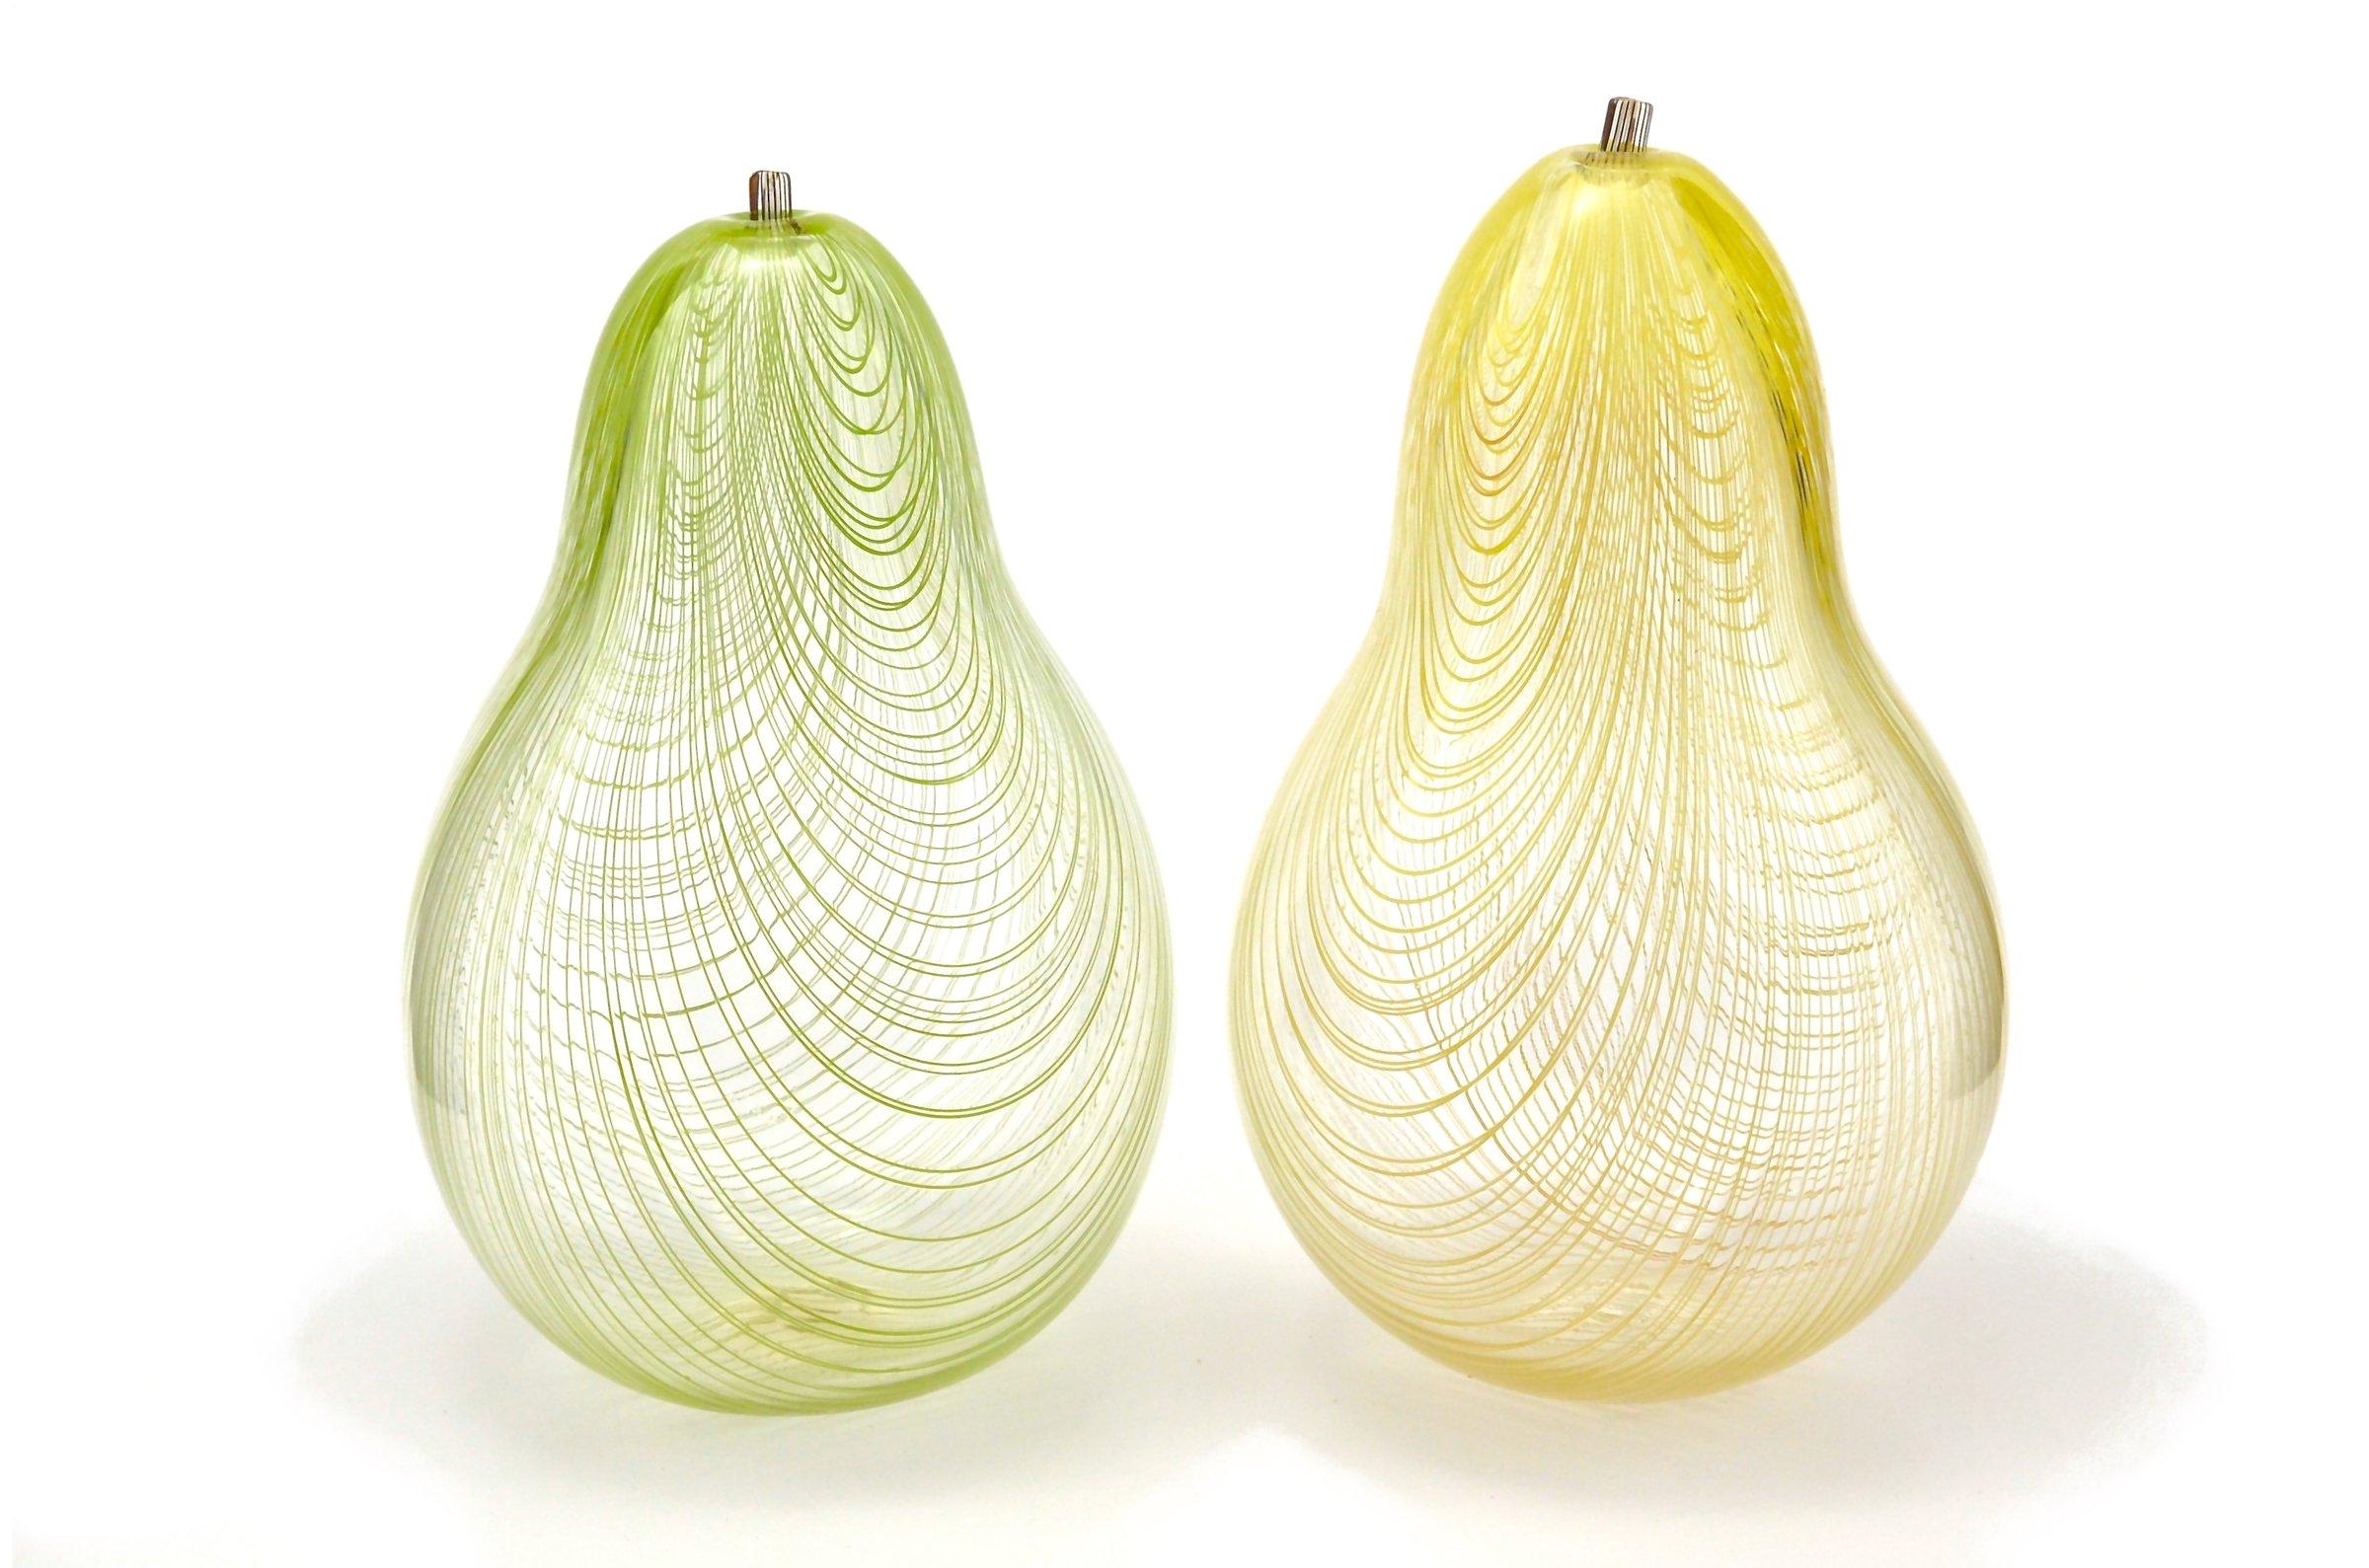 Glass Pears by Marc Carmen (Art Glass Sculpture)   Artful Home